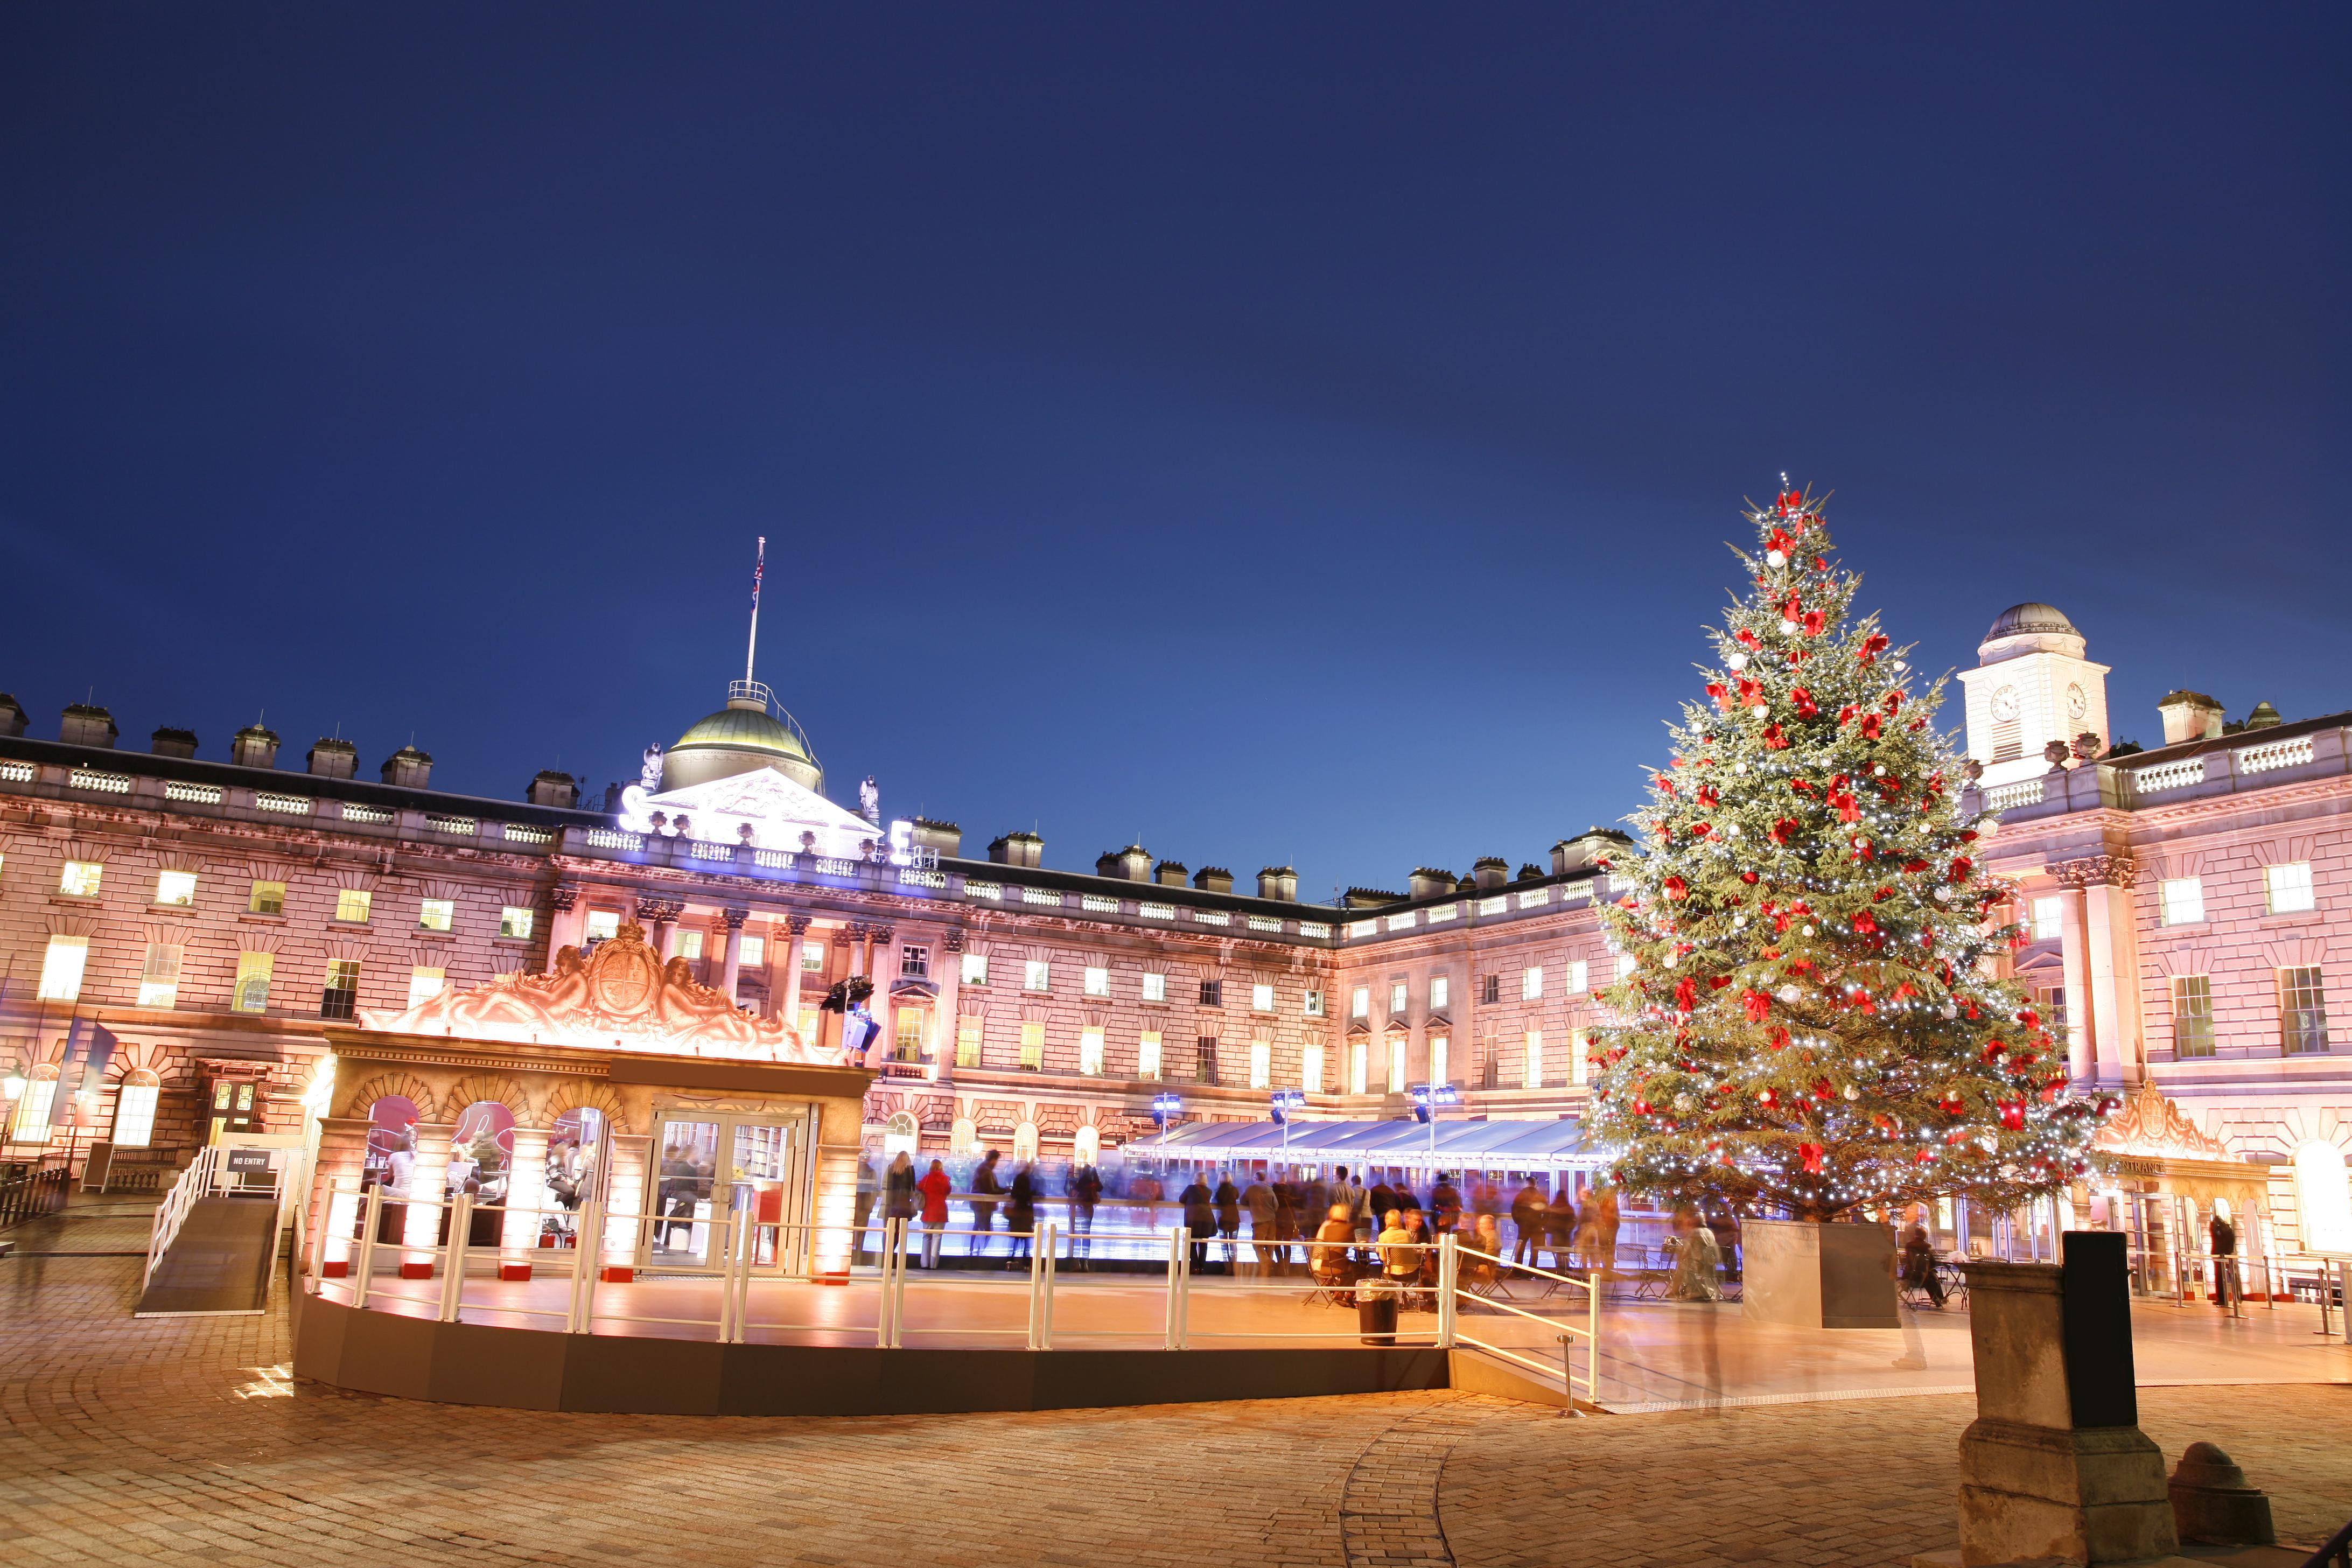 Christmas Travel Deals 2019 Last Minute Christmas Travel Deals 2019 | Skyscanner